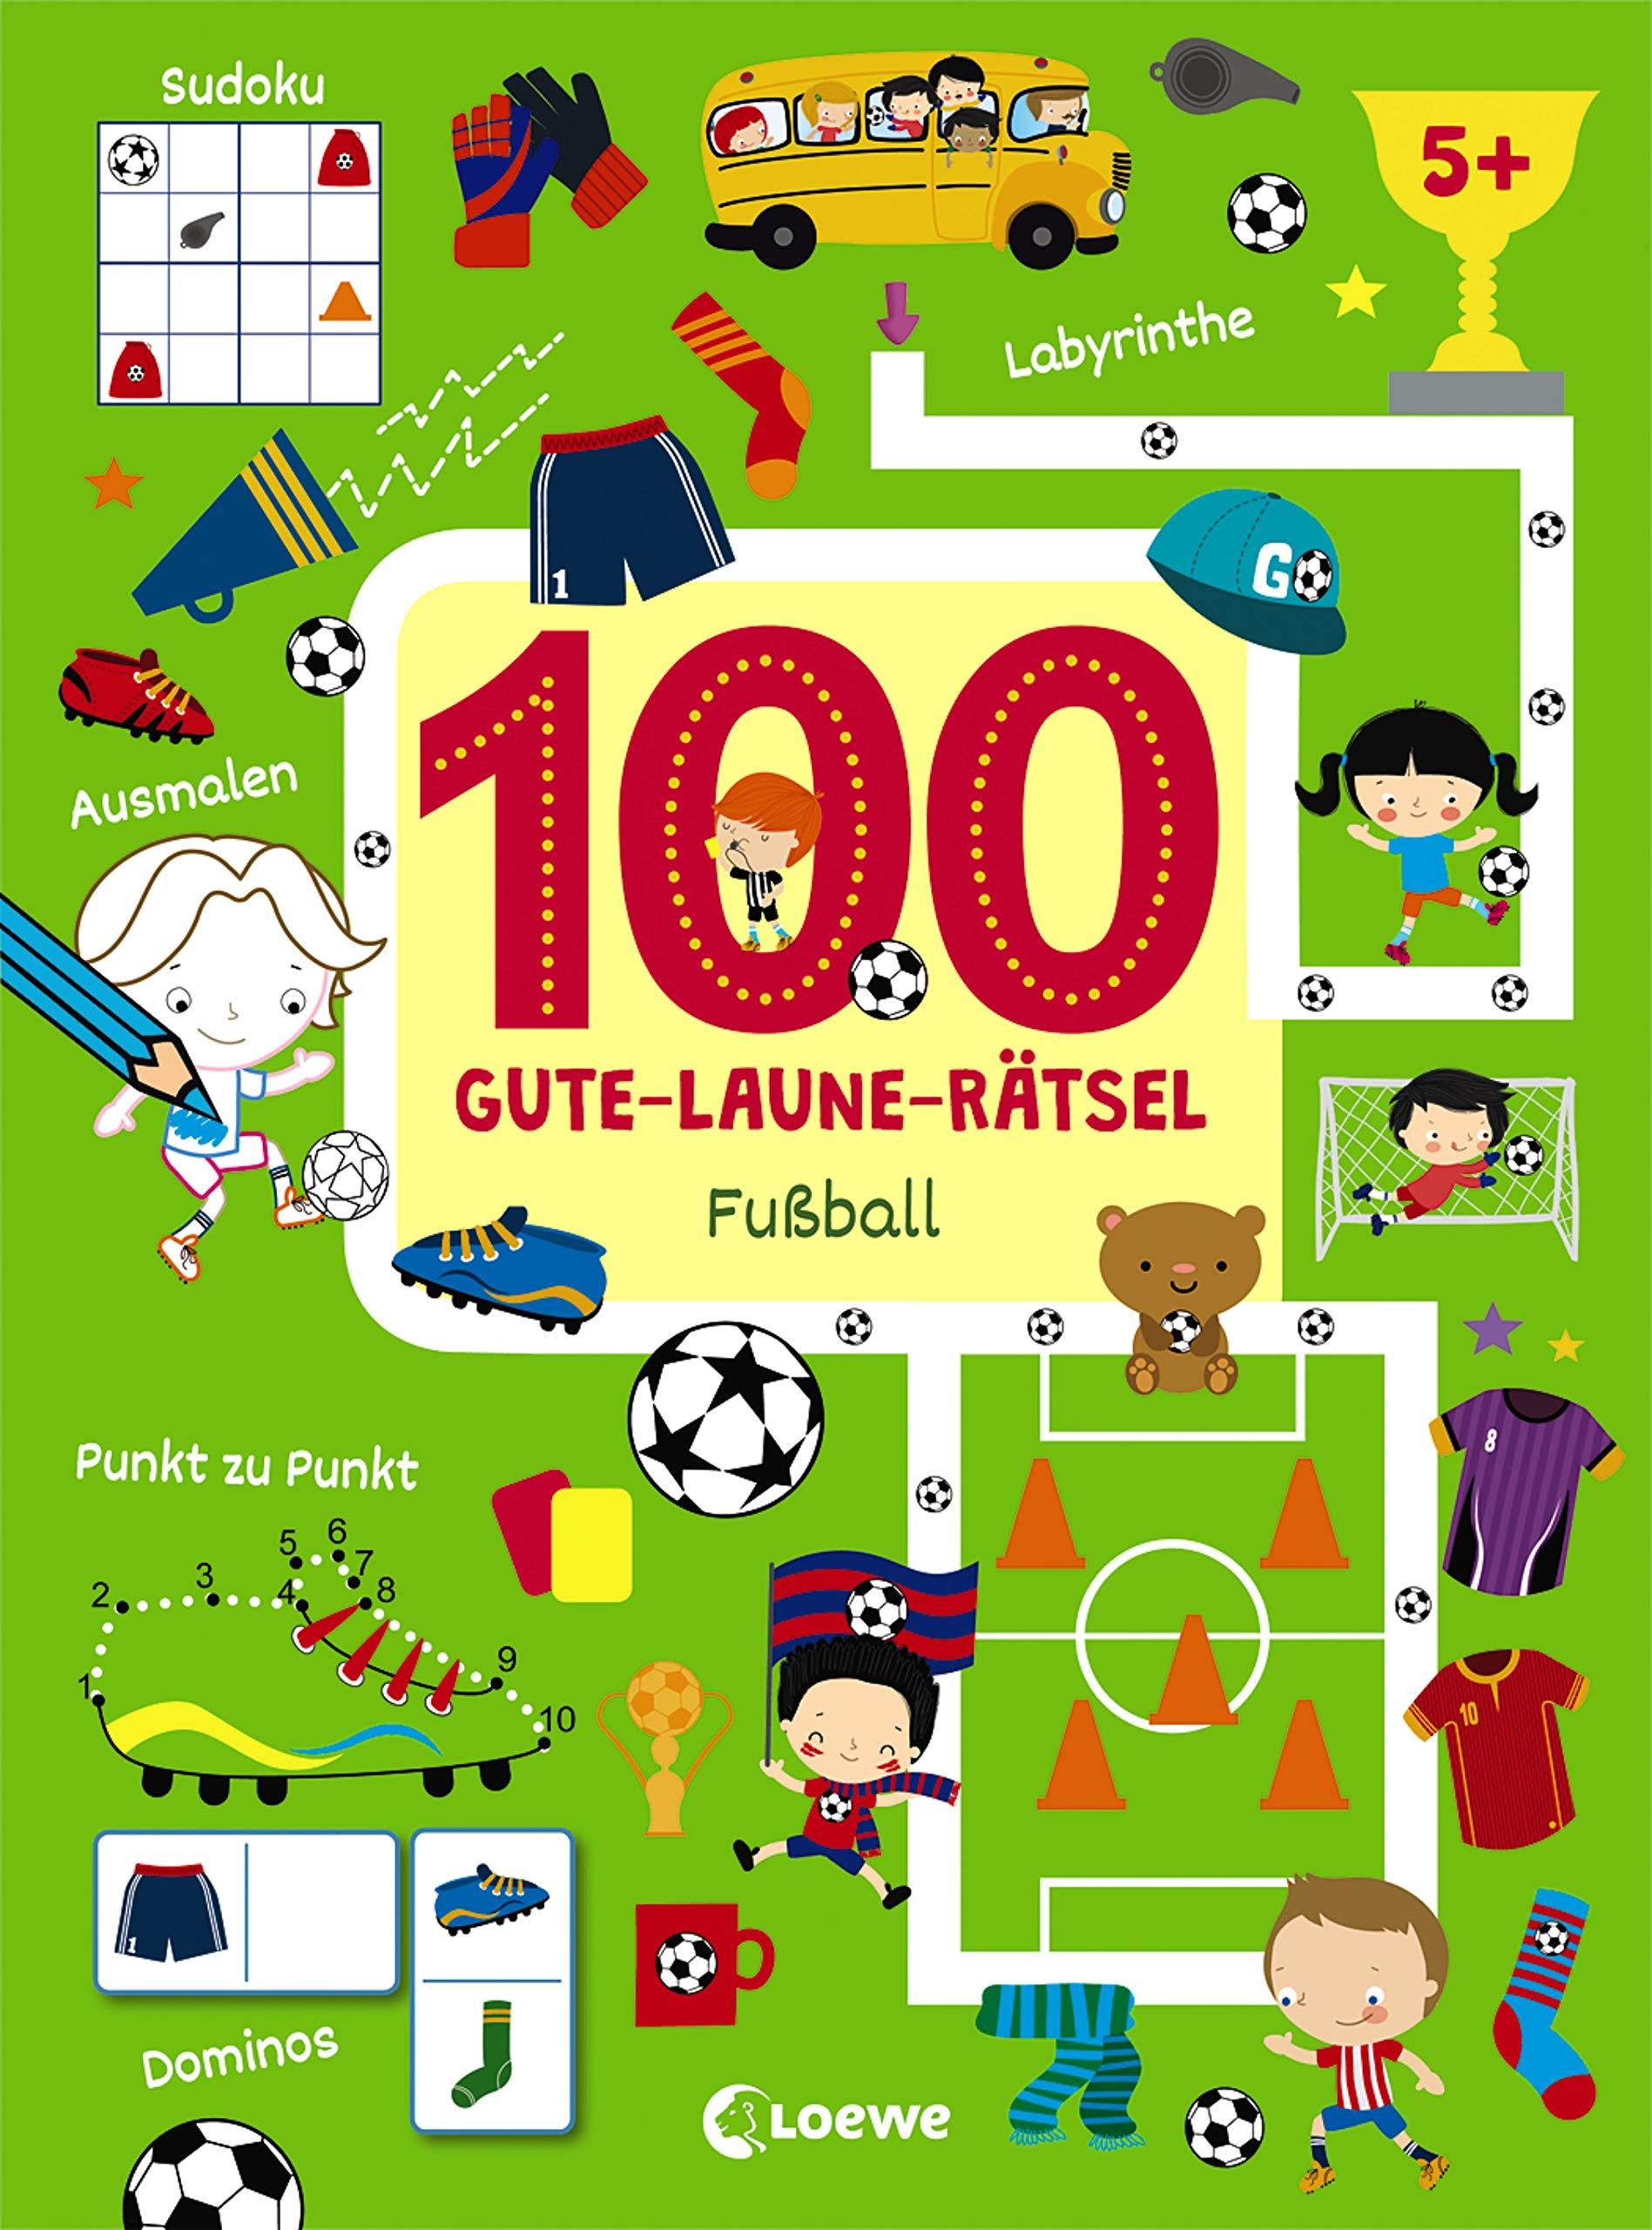 100 Gute-Laune-Rätsel Fußball  100 Gute-Laune-Rätsel